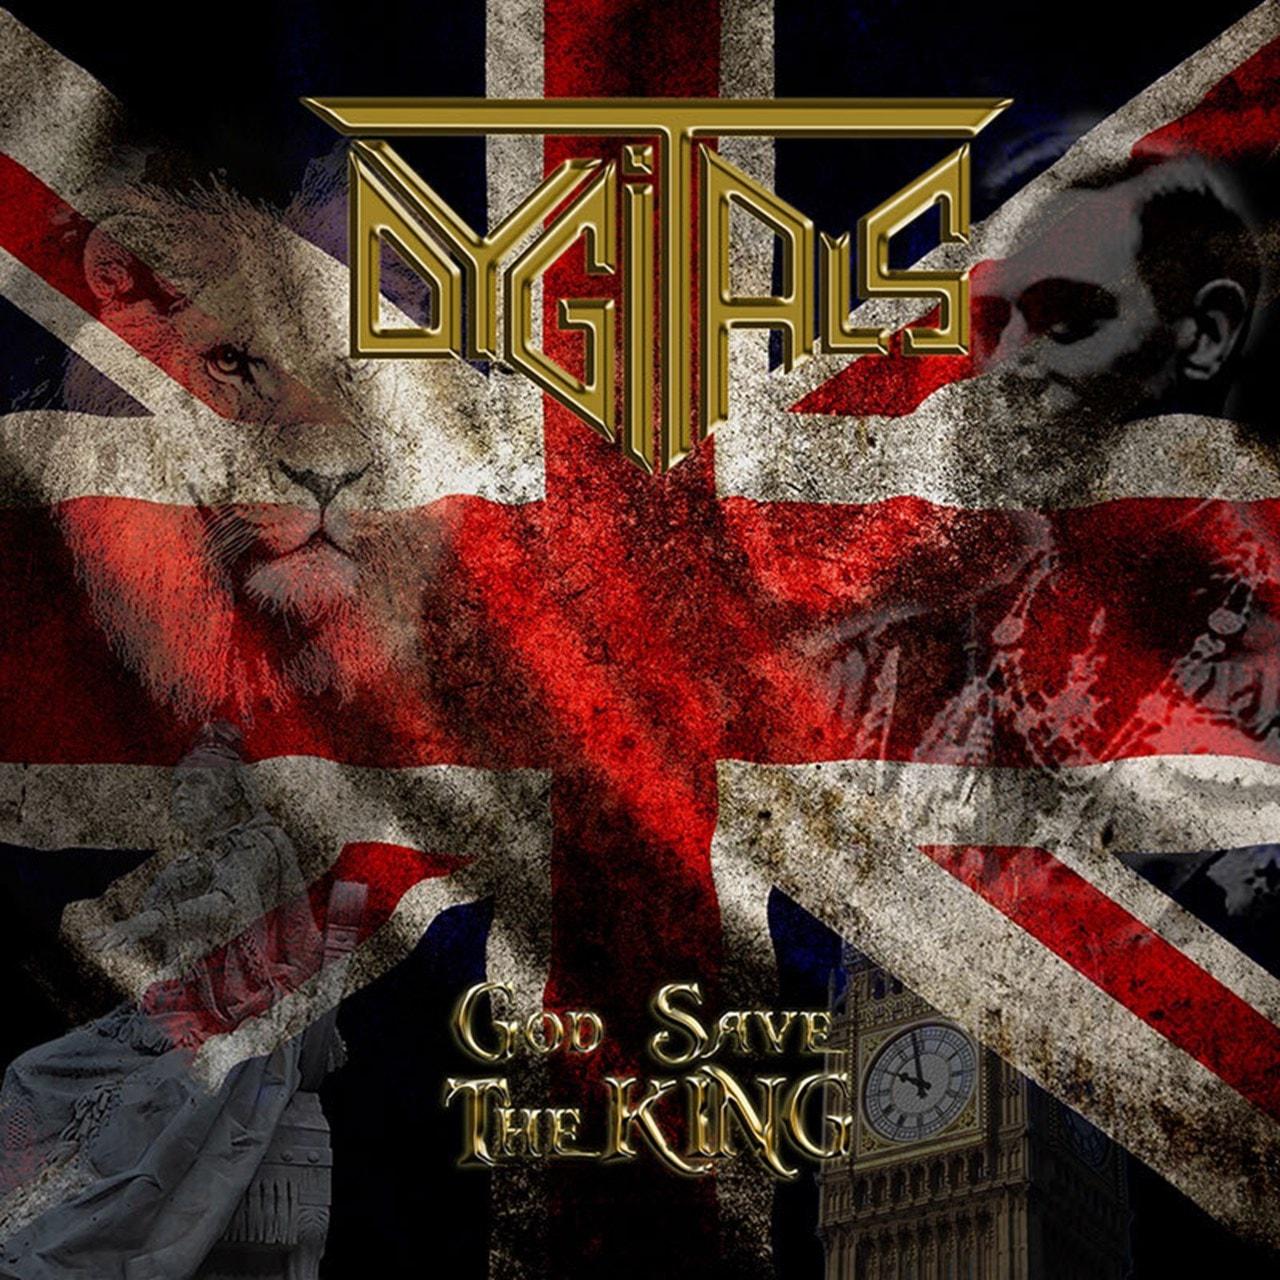 God Save the King - 1